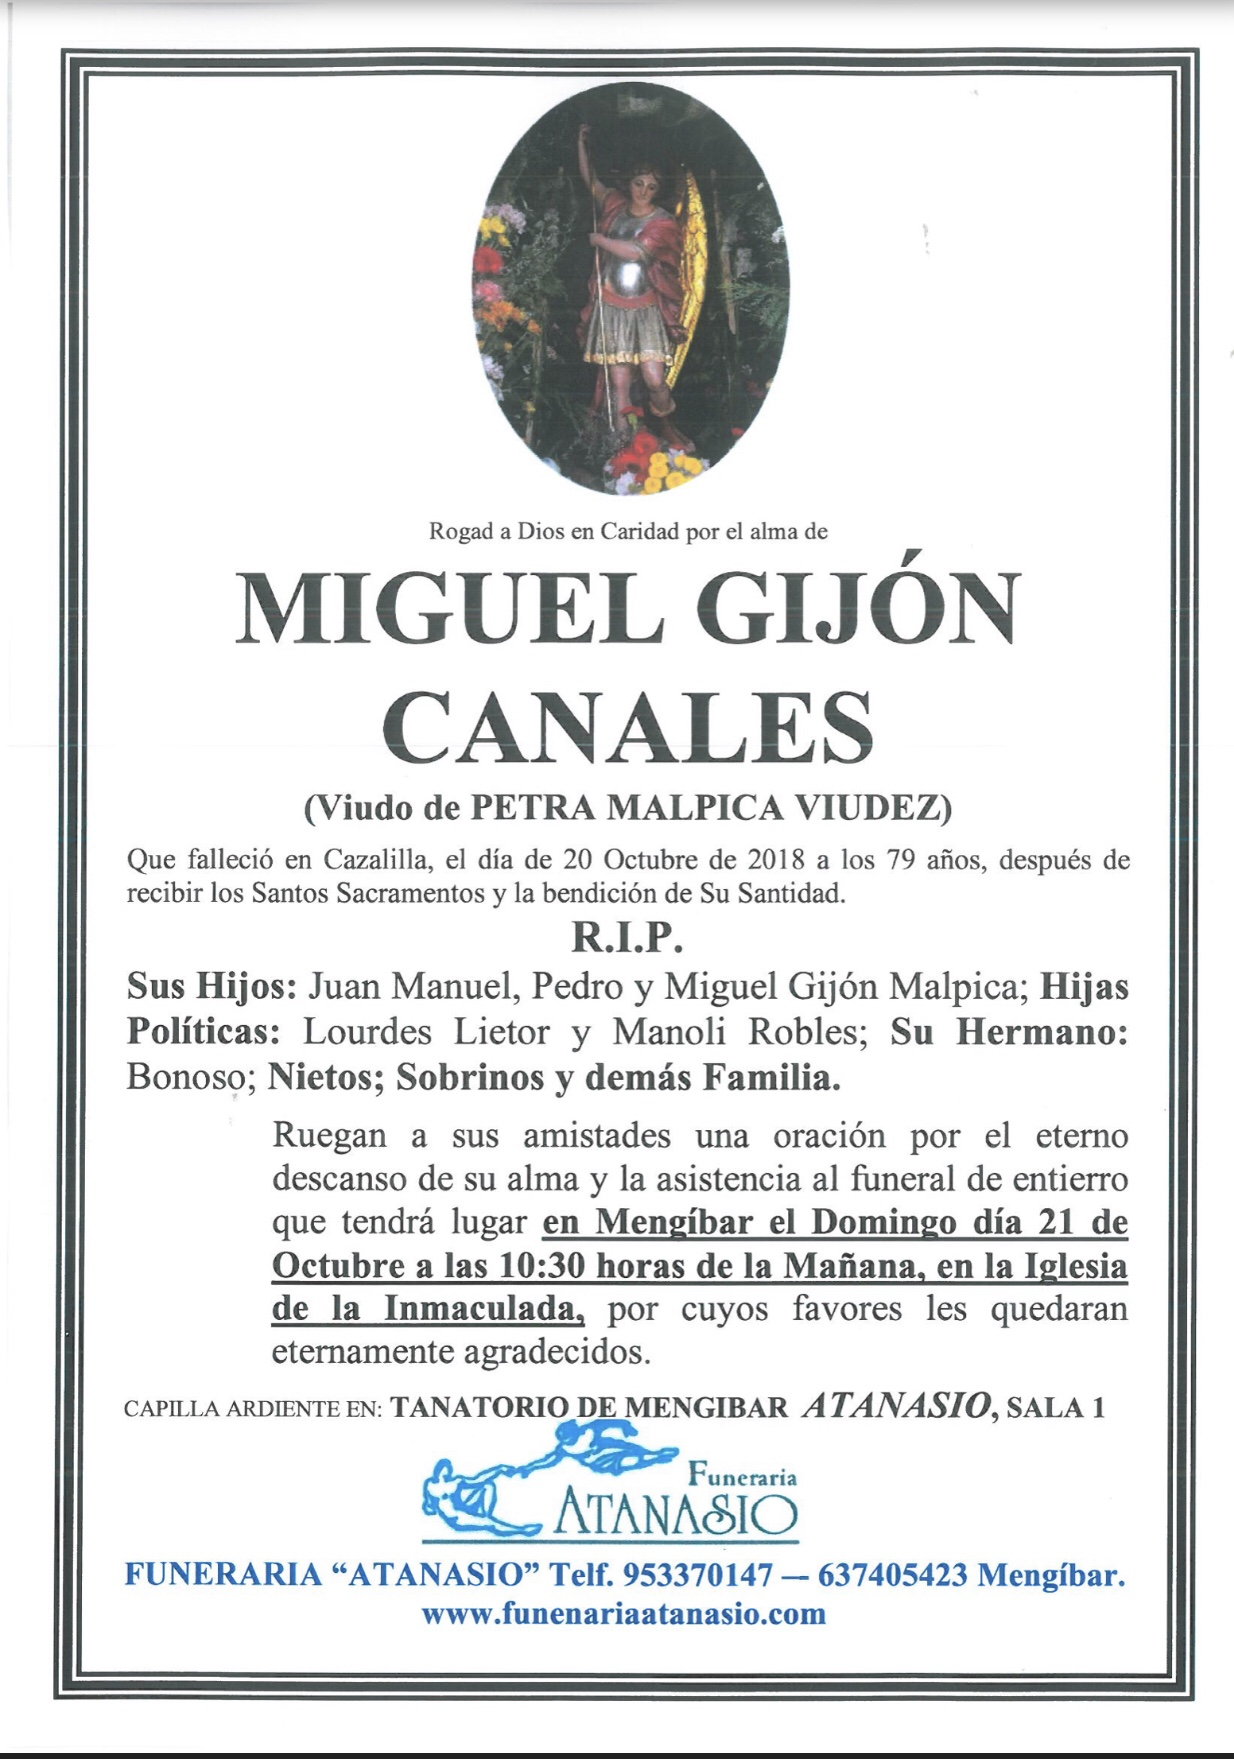 D miguel gijon canales funeraria atanasio for Jardin noega tanatorio gijon esquelas